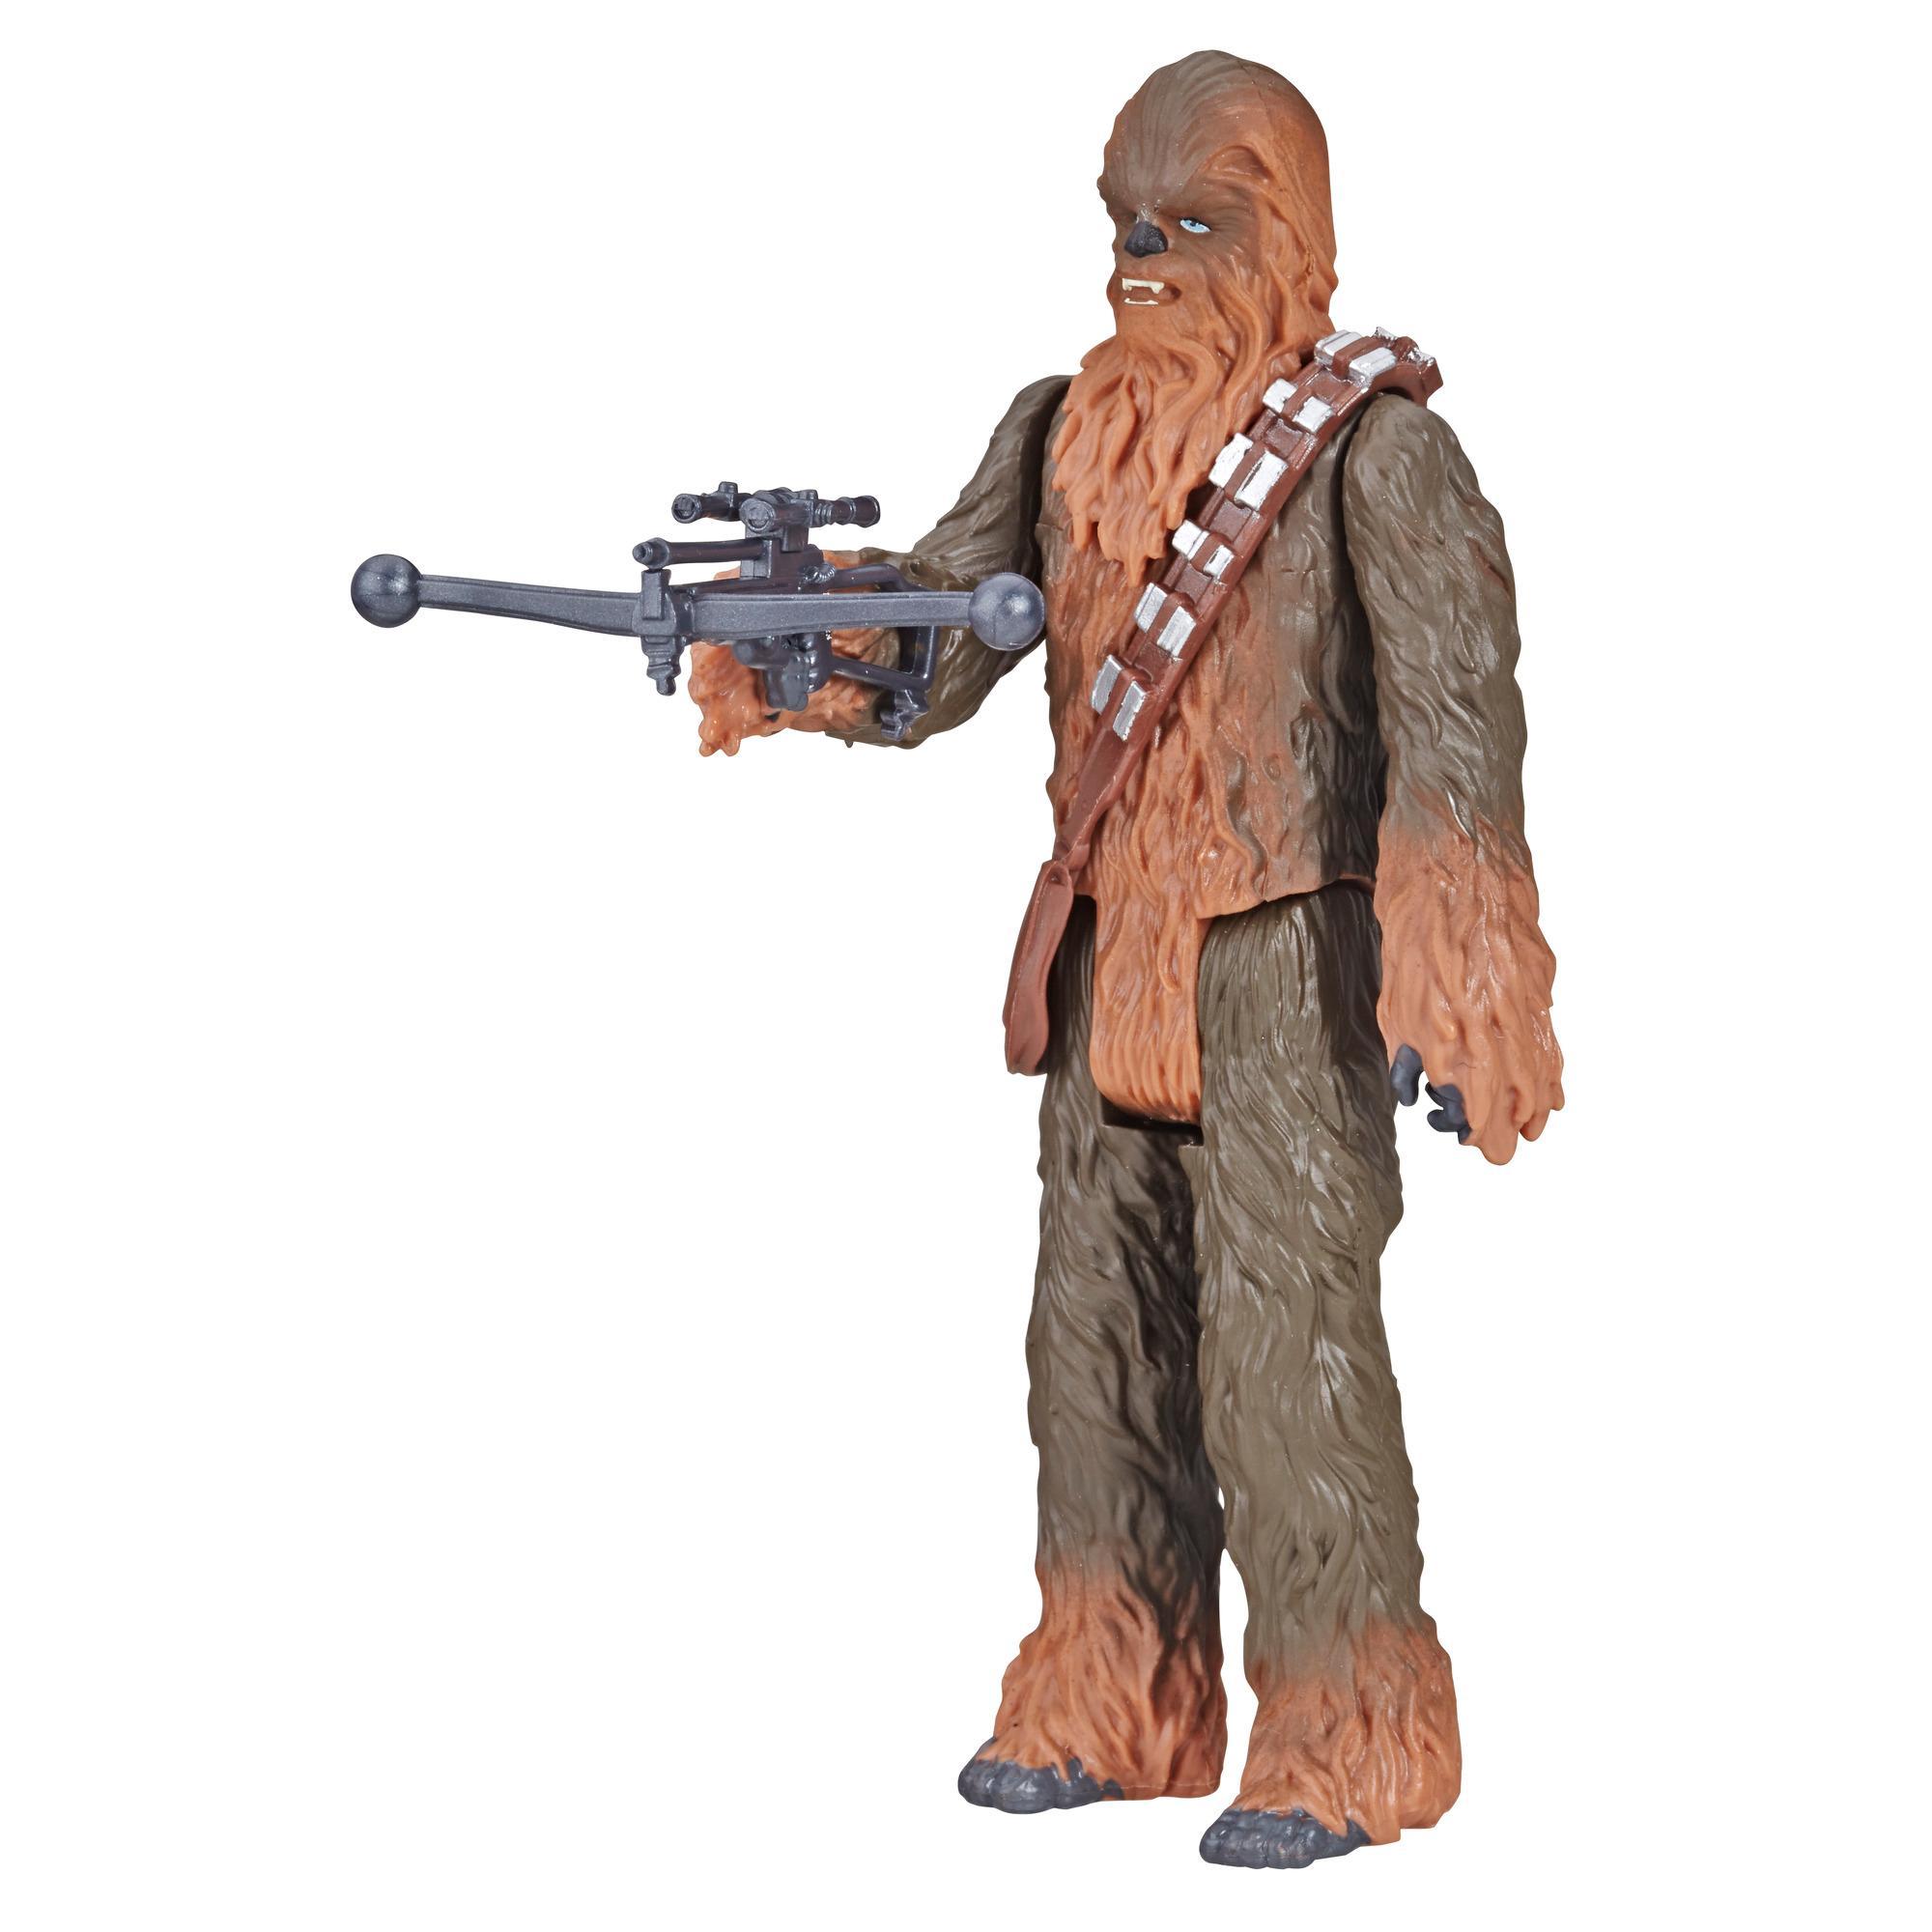 Star Wars Galaxy of Adventures Chewbacca Figur